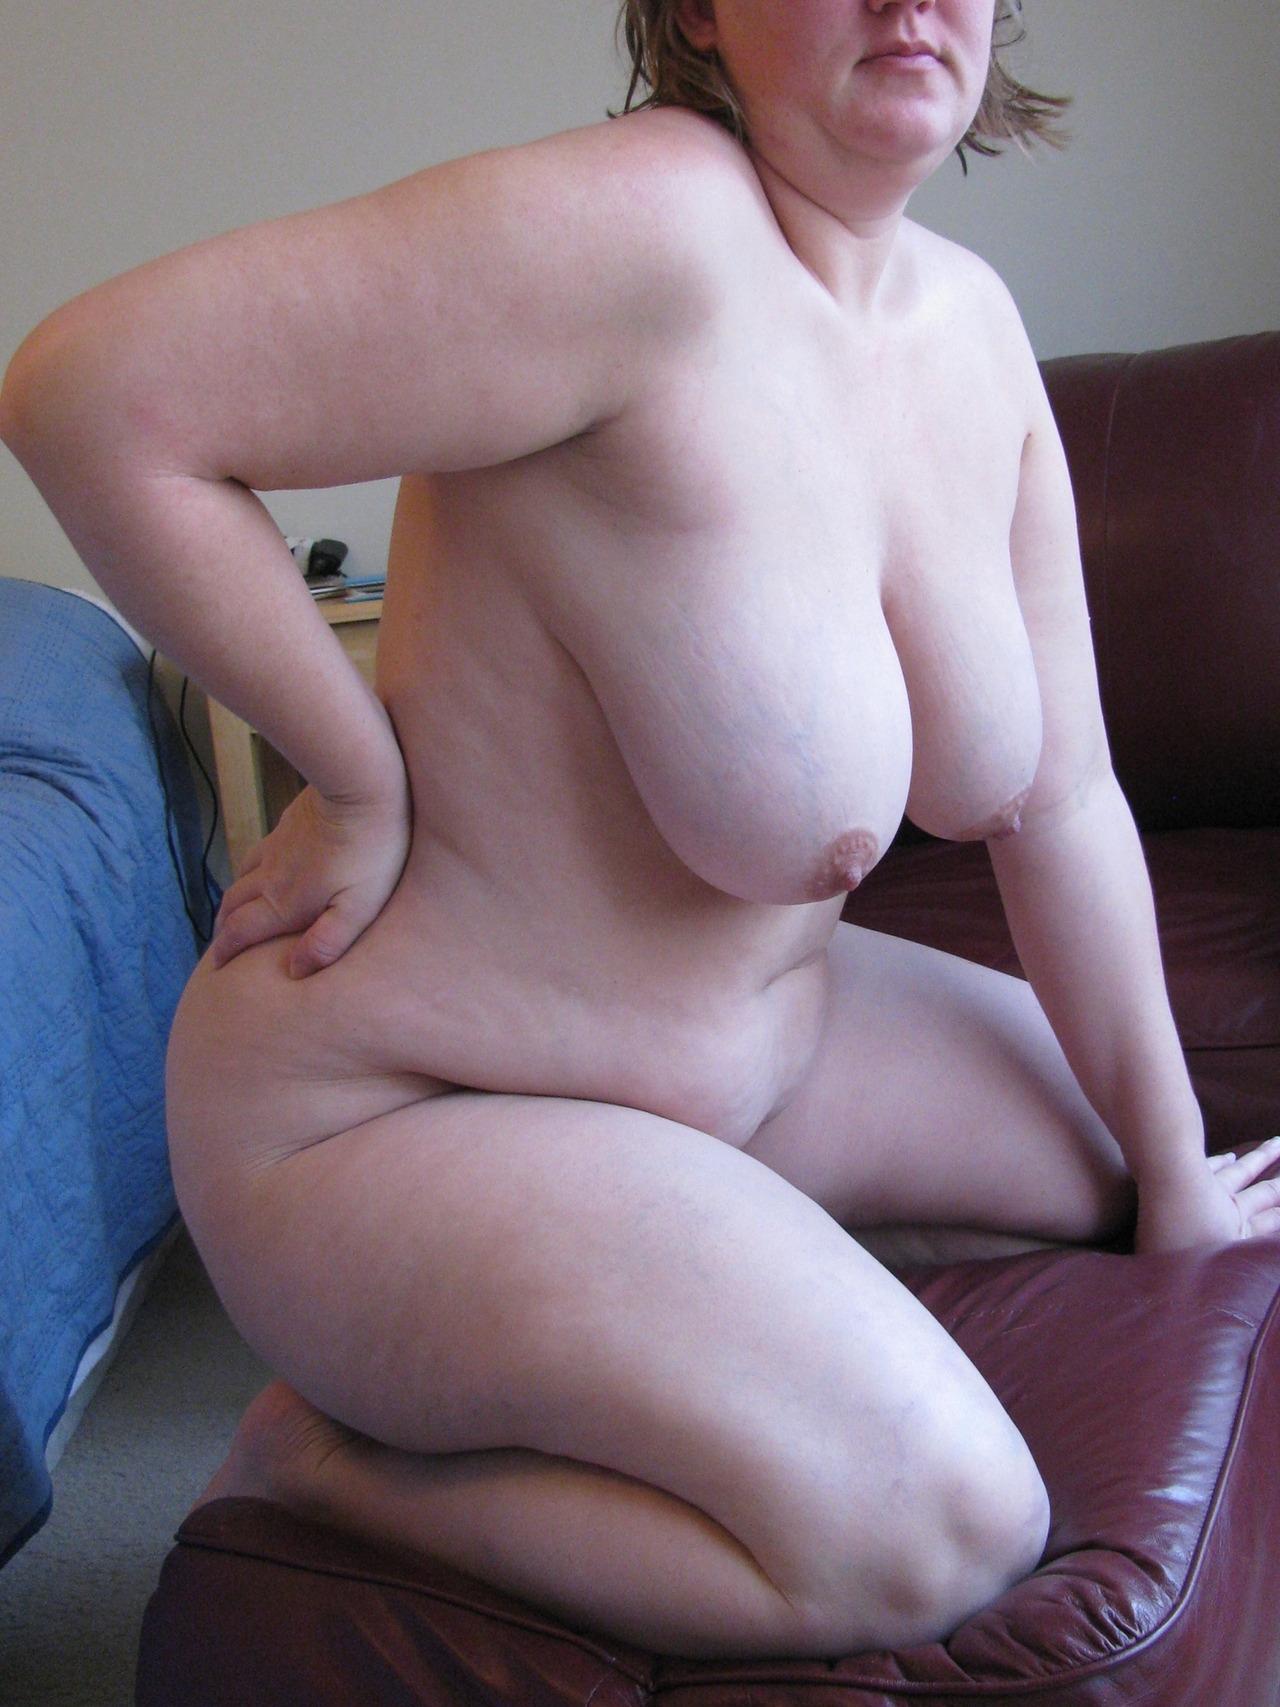 bbw naked video